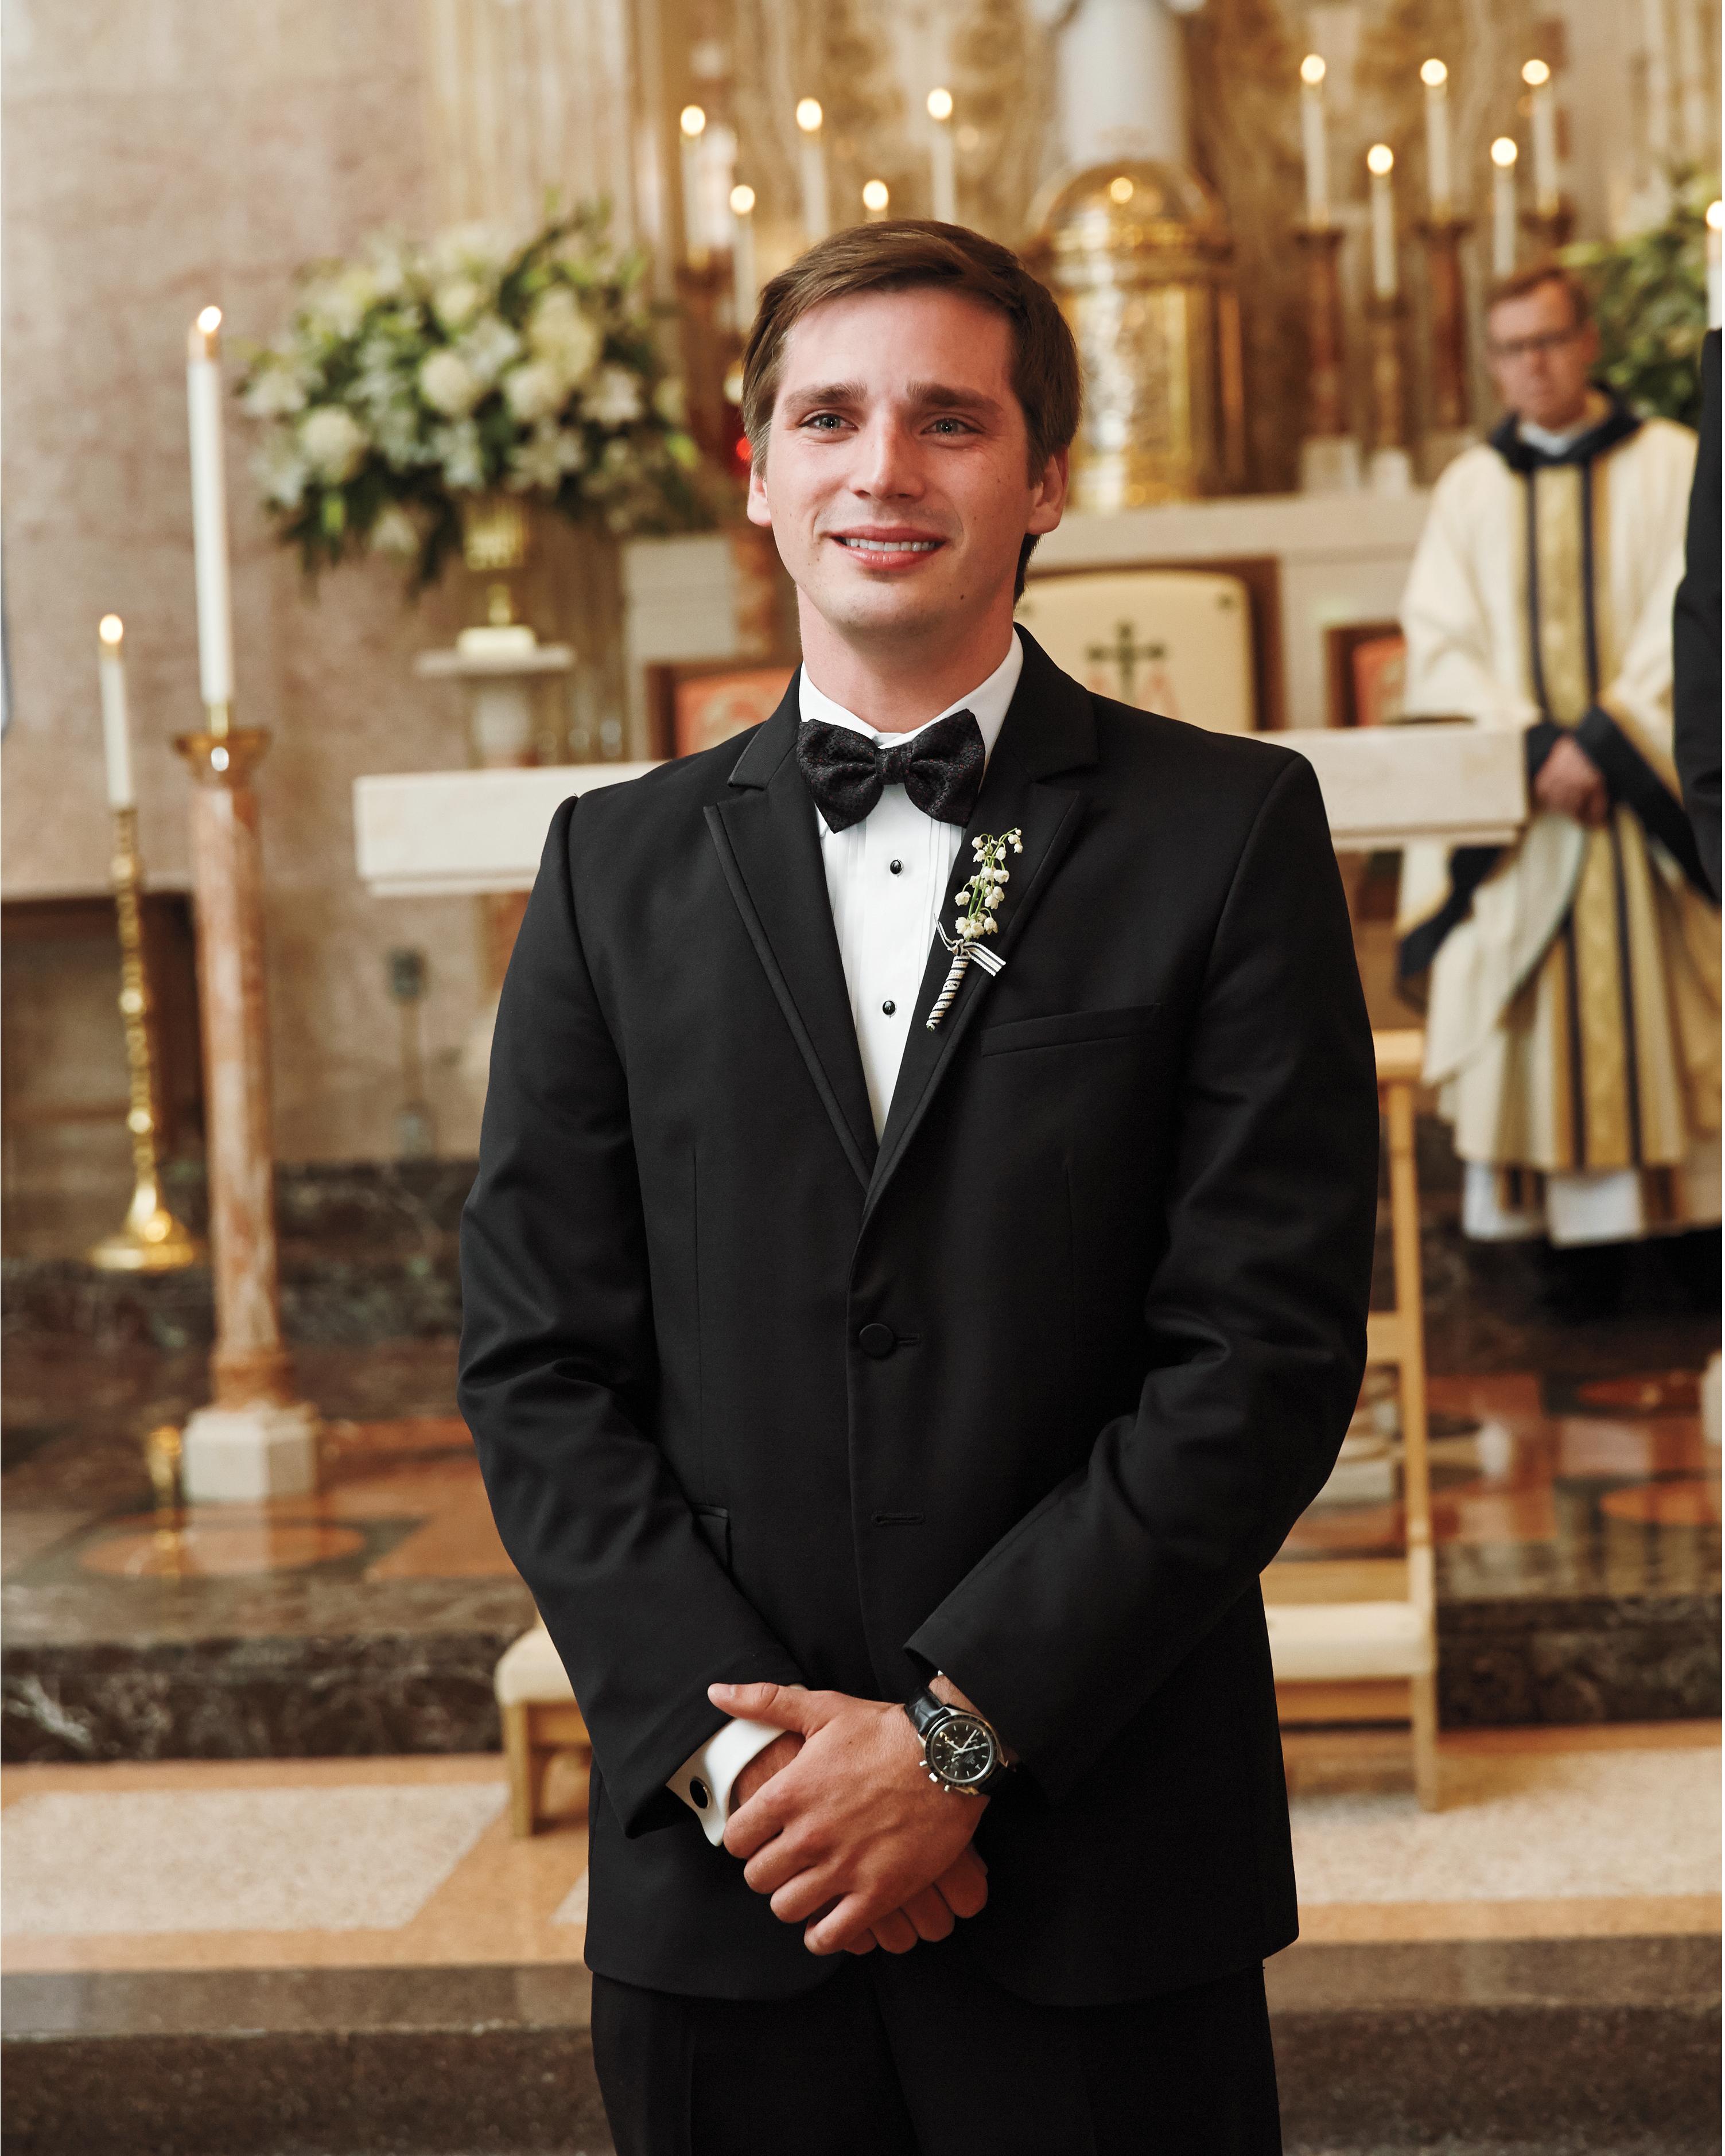 groom-altar-msw-05-24-13-0816-md110142.jpg